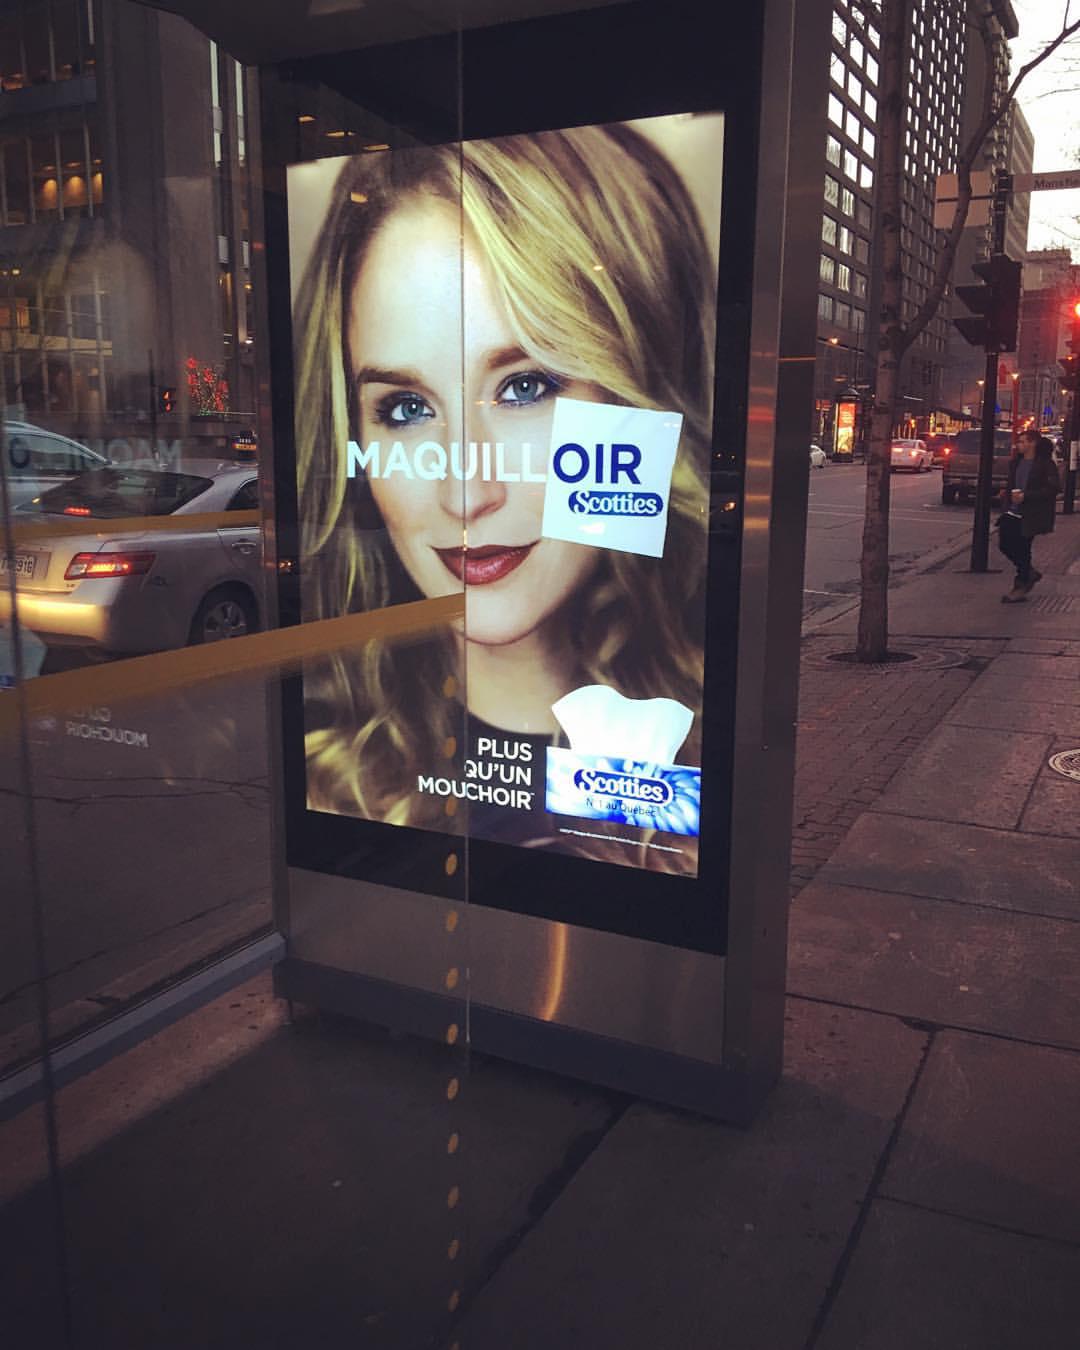 Just waiting for the bus like everyone else. #model #foliofever #campaign #directbook #canada #canadianmodel @foliomontreal @angiesmodels @astonmodels @twomodelsdo